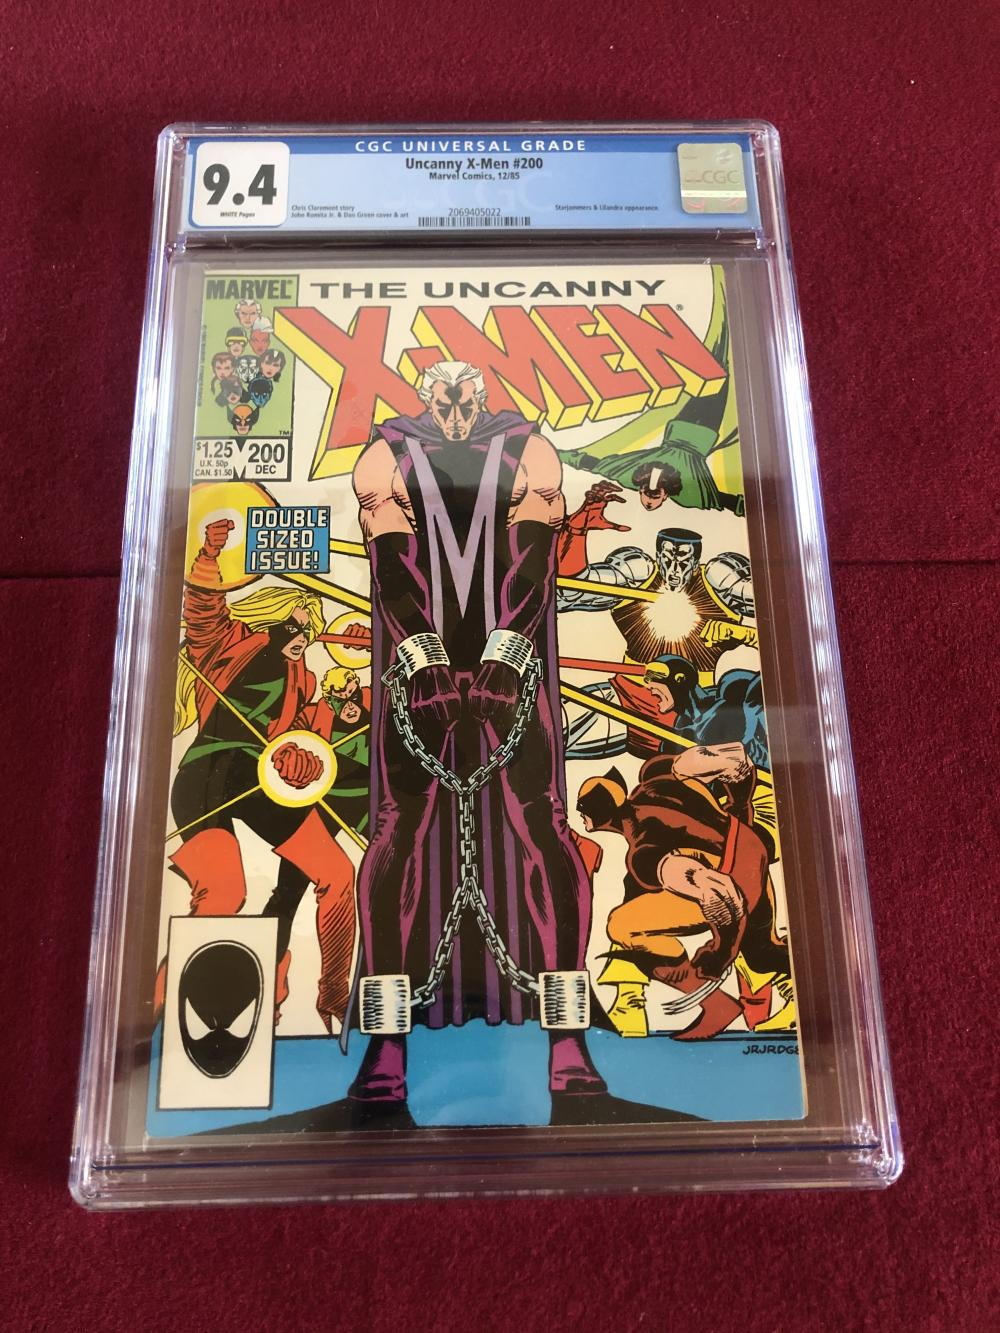 Uncanny X-men #200 Marvel comic - graded